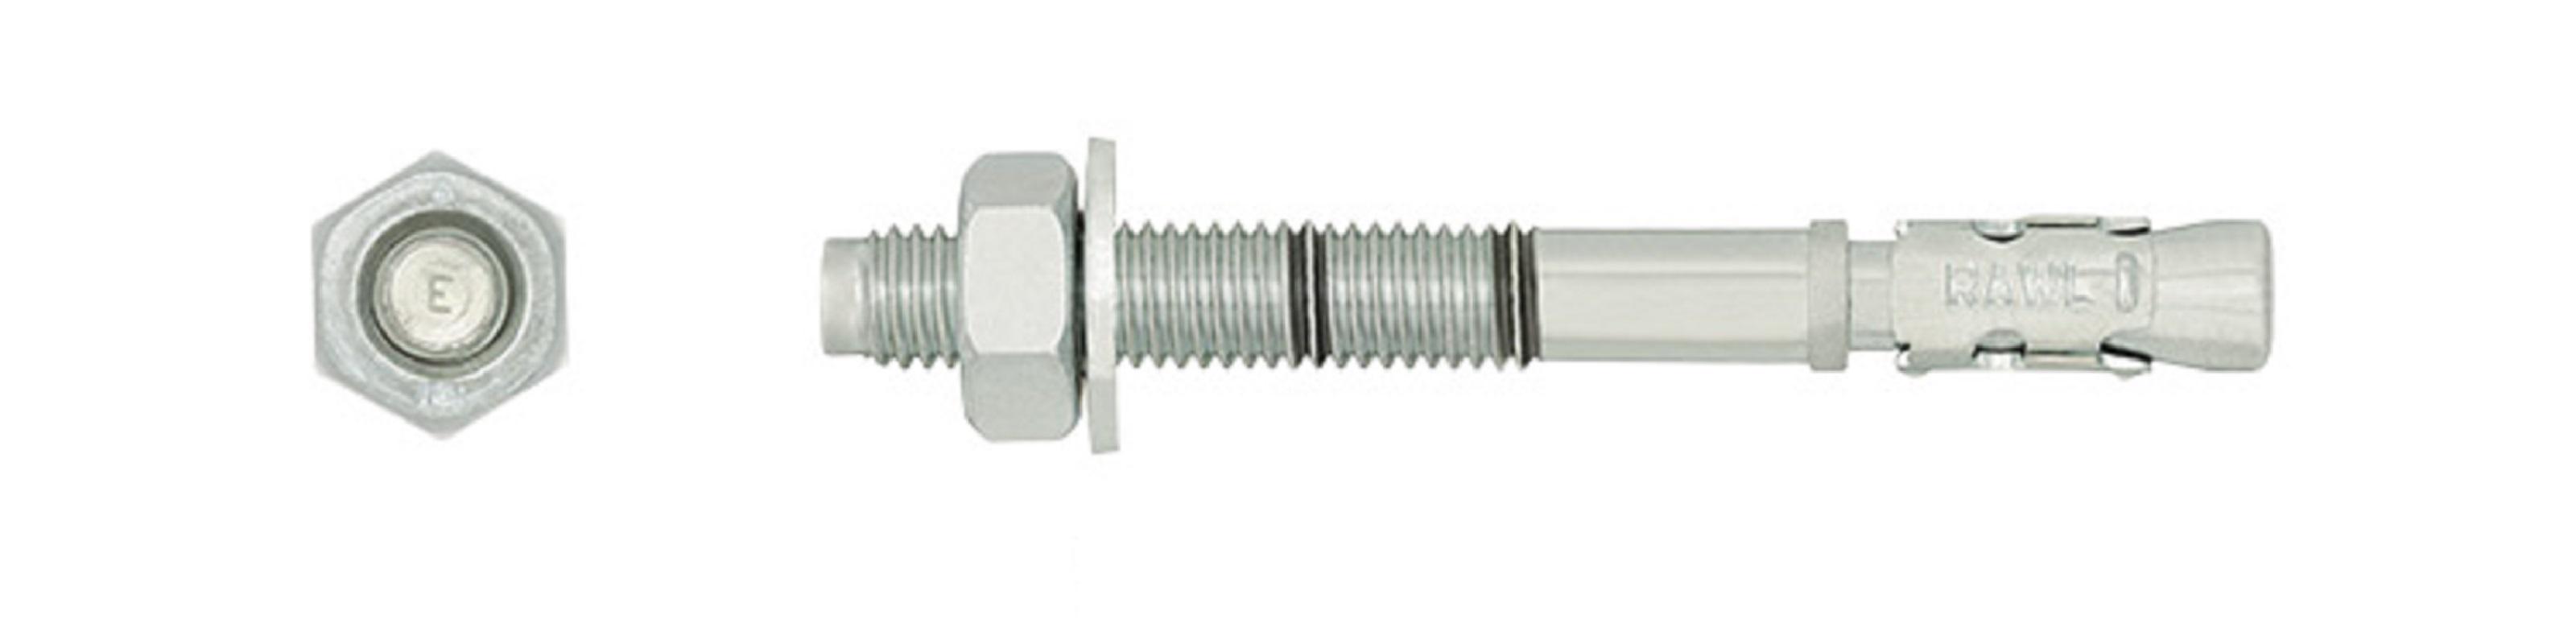 Rawl Trade Throughbolt M8X115 BZP (4pcs)